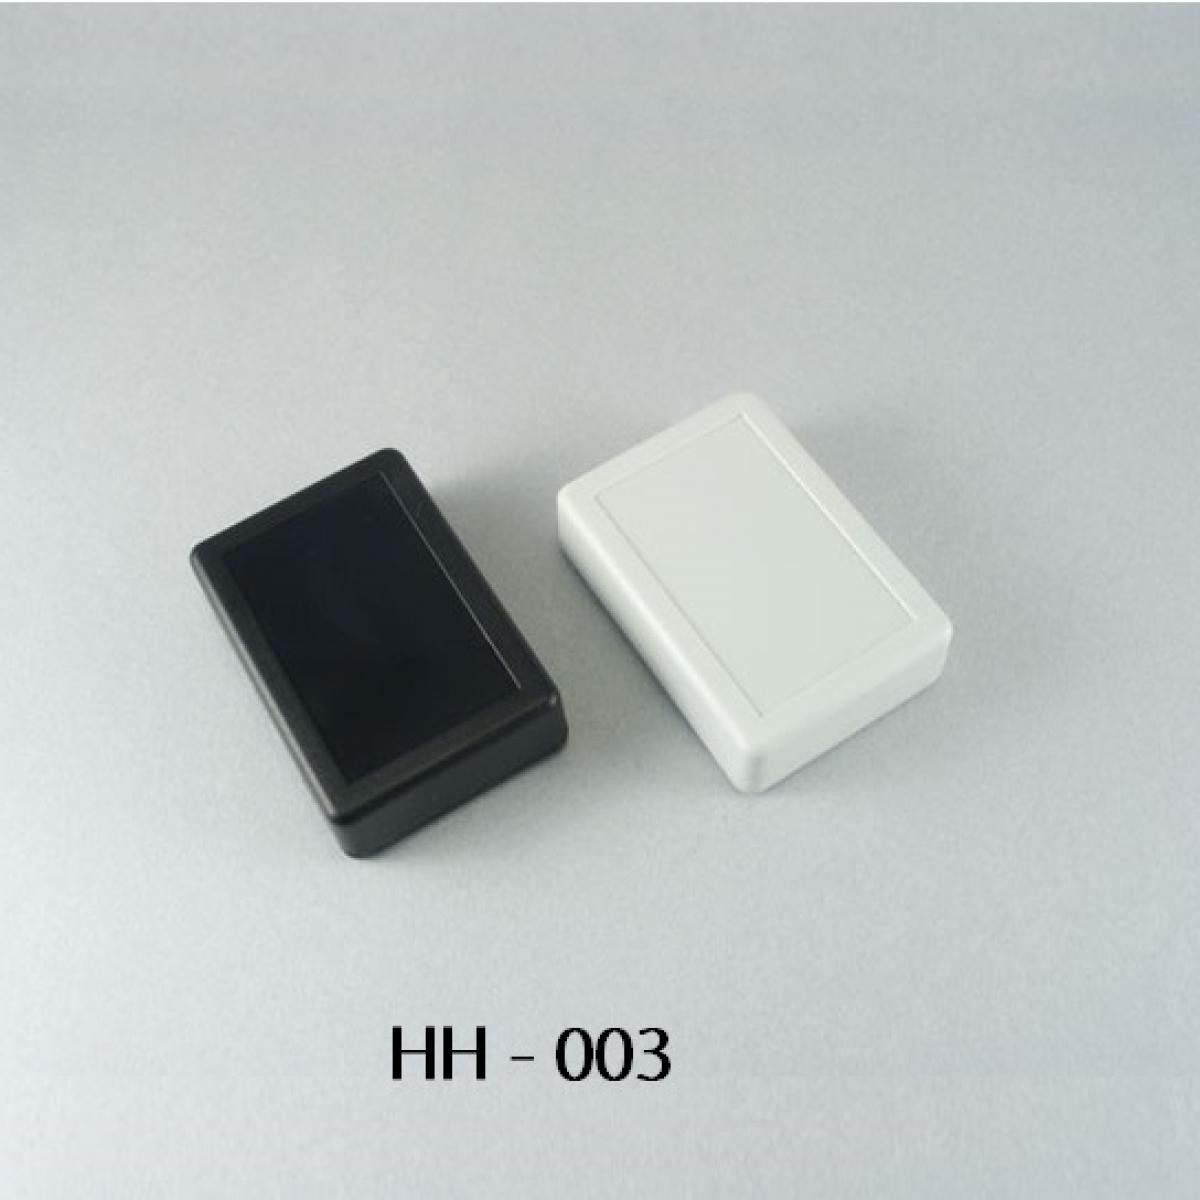 HH-003